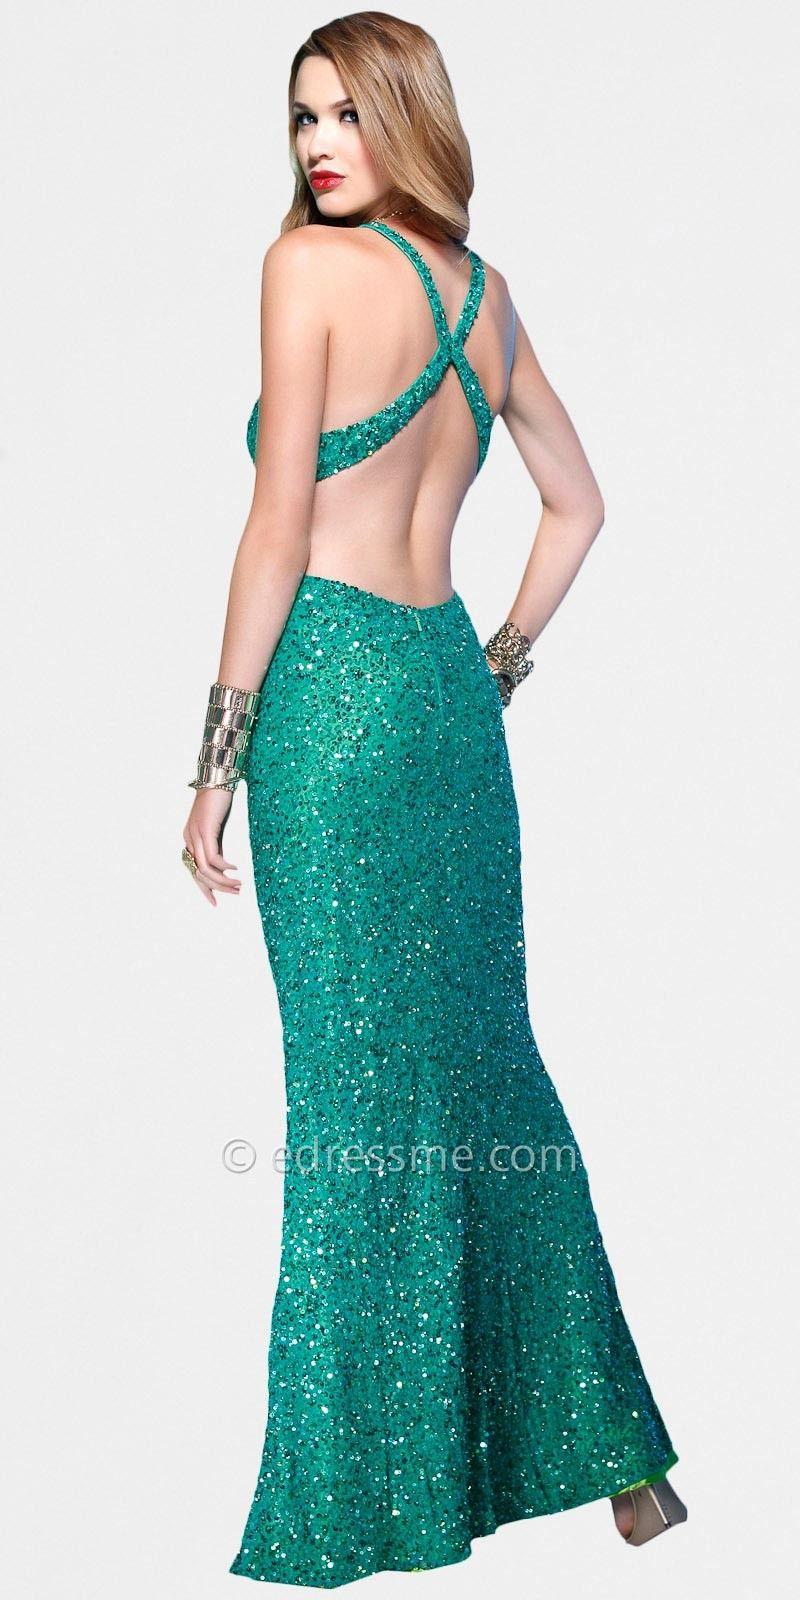 Blue sequin halter prom dress